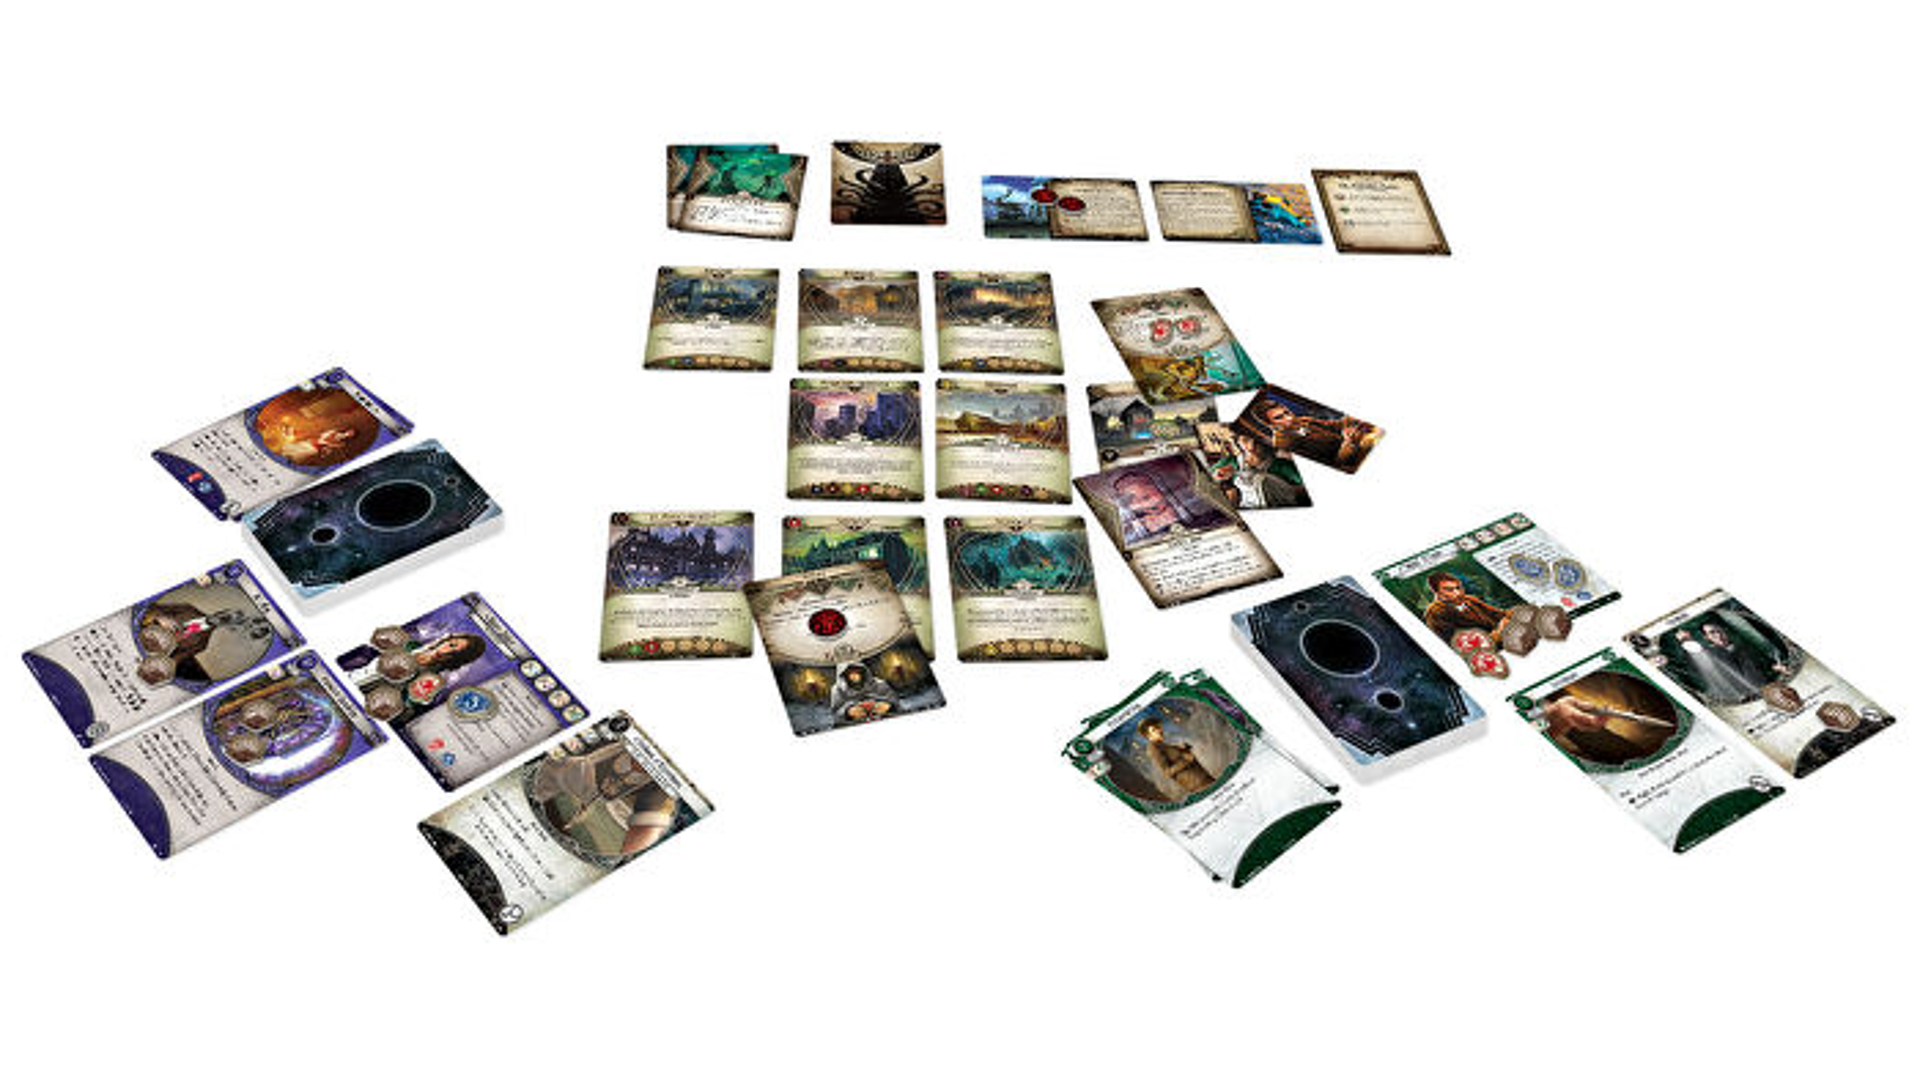 arkham-horror-the-card-game-lcg-layout.jpg